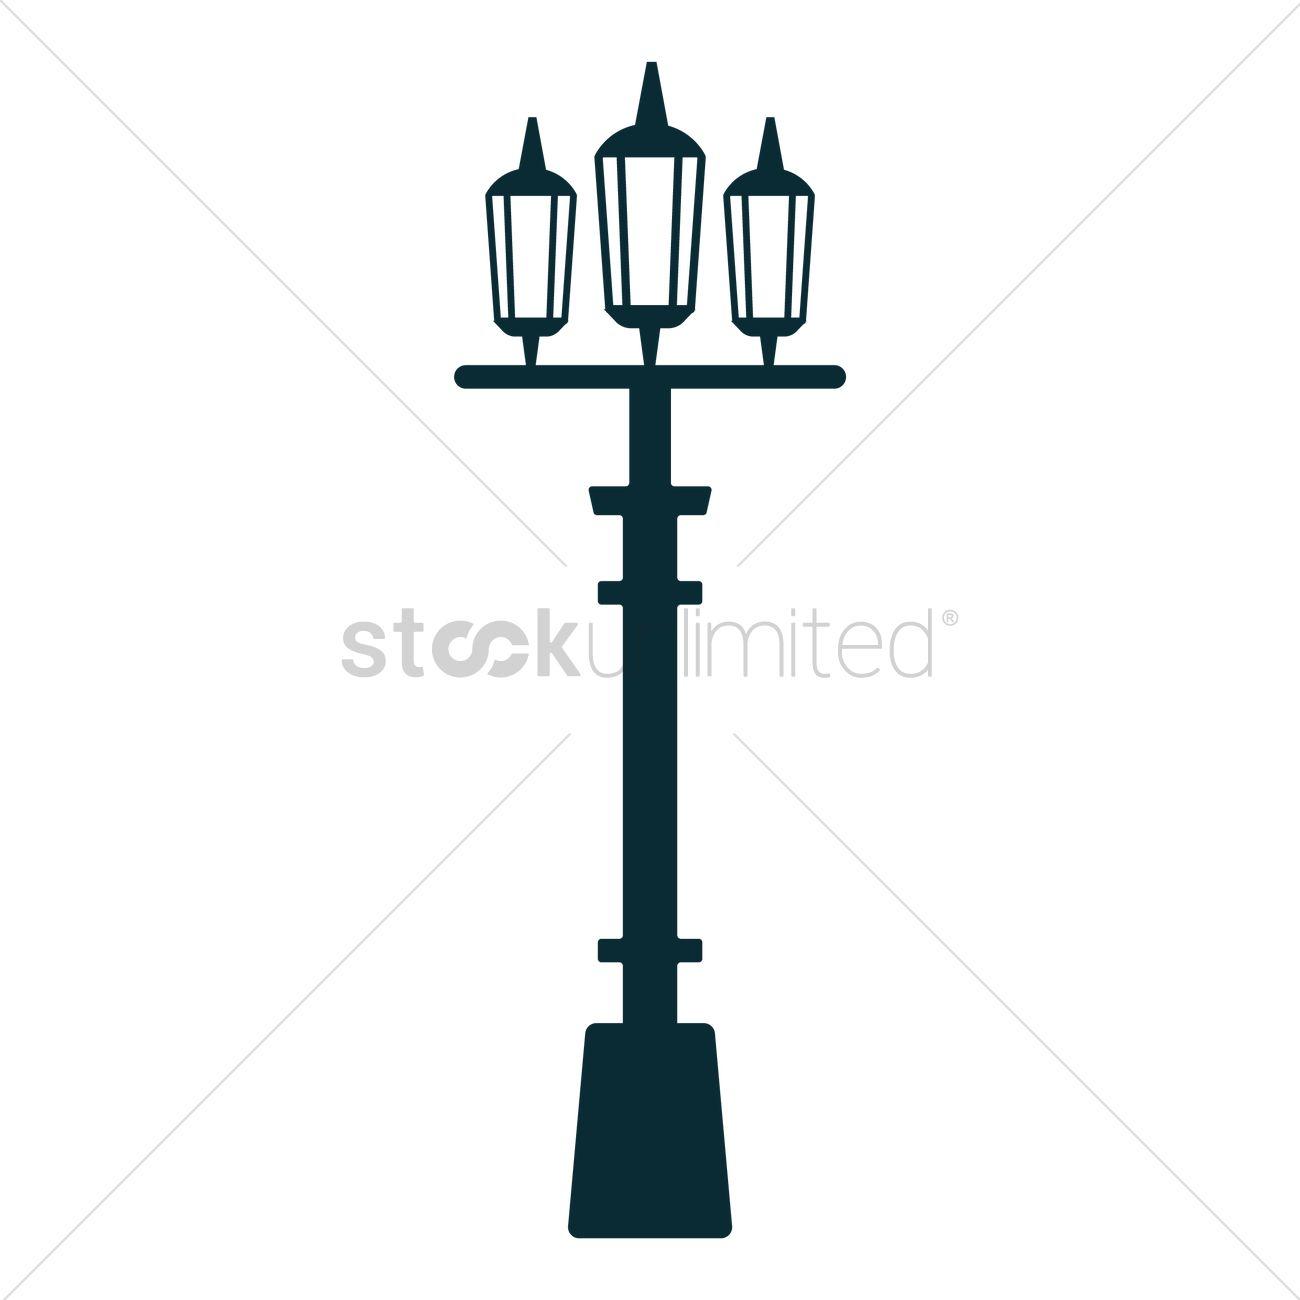 1300x1300 London Street Lamp Vector Image